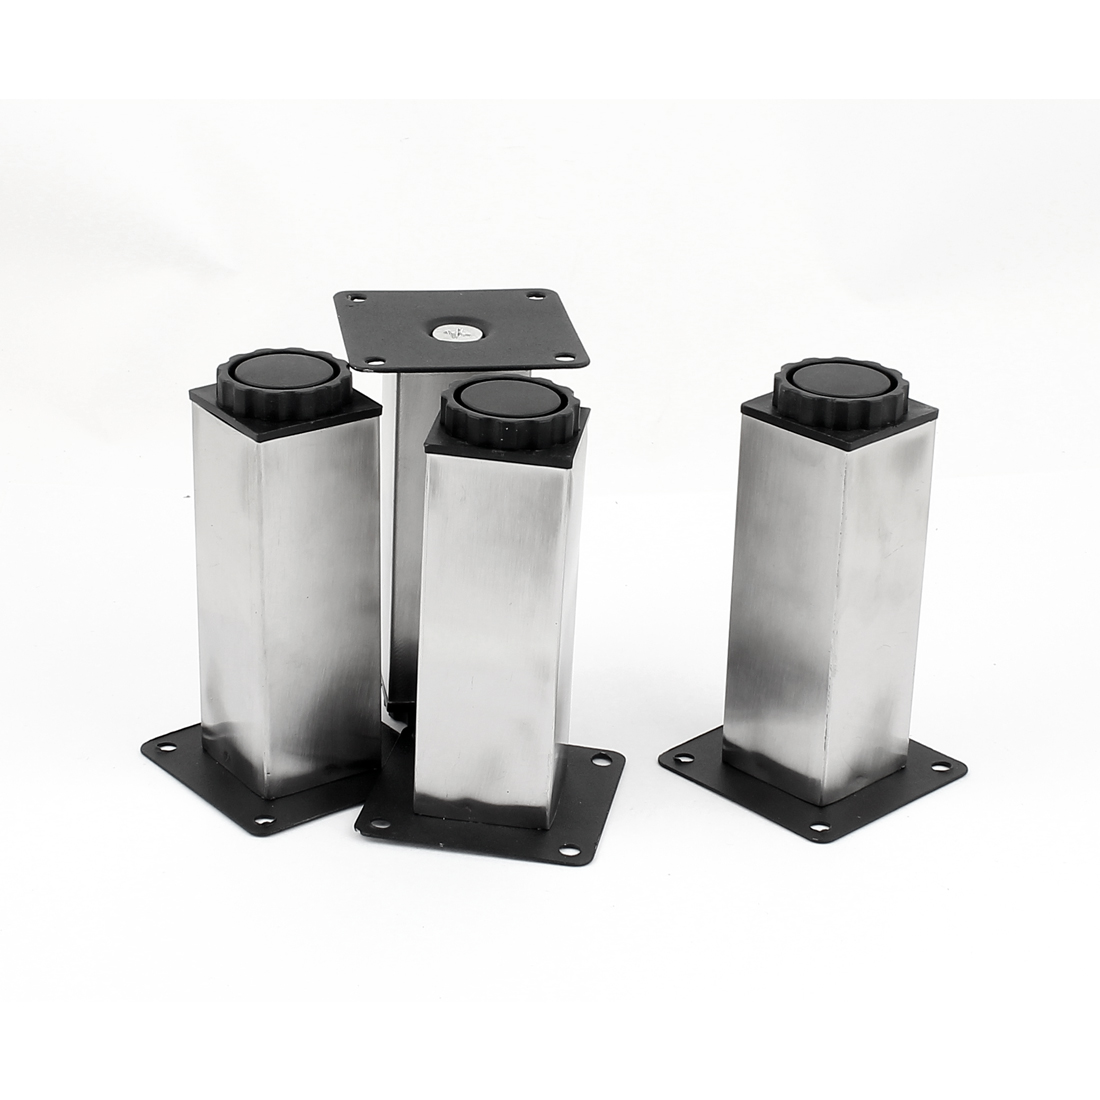 120mm x 38mm x 38mmn Metal Feet Adjustable Square Cabinet Legs Silver Tone 4pcs